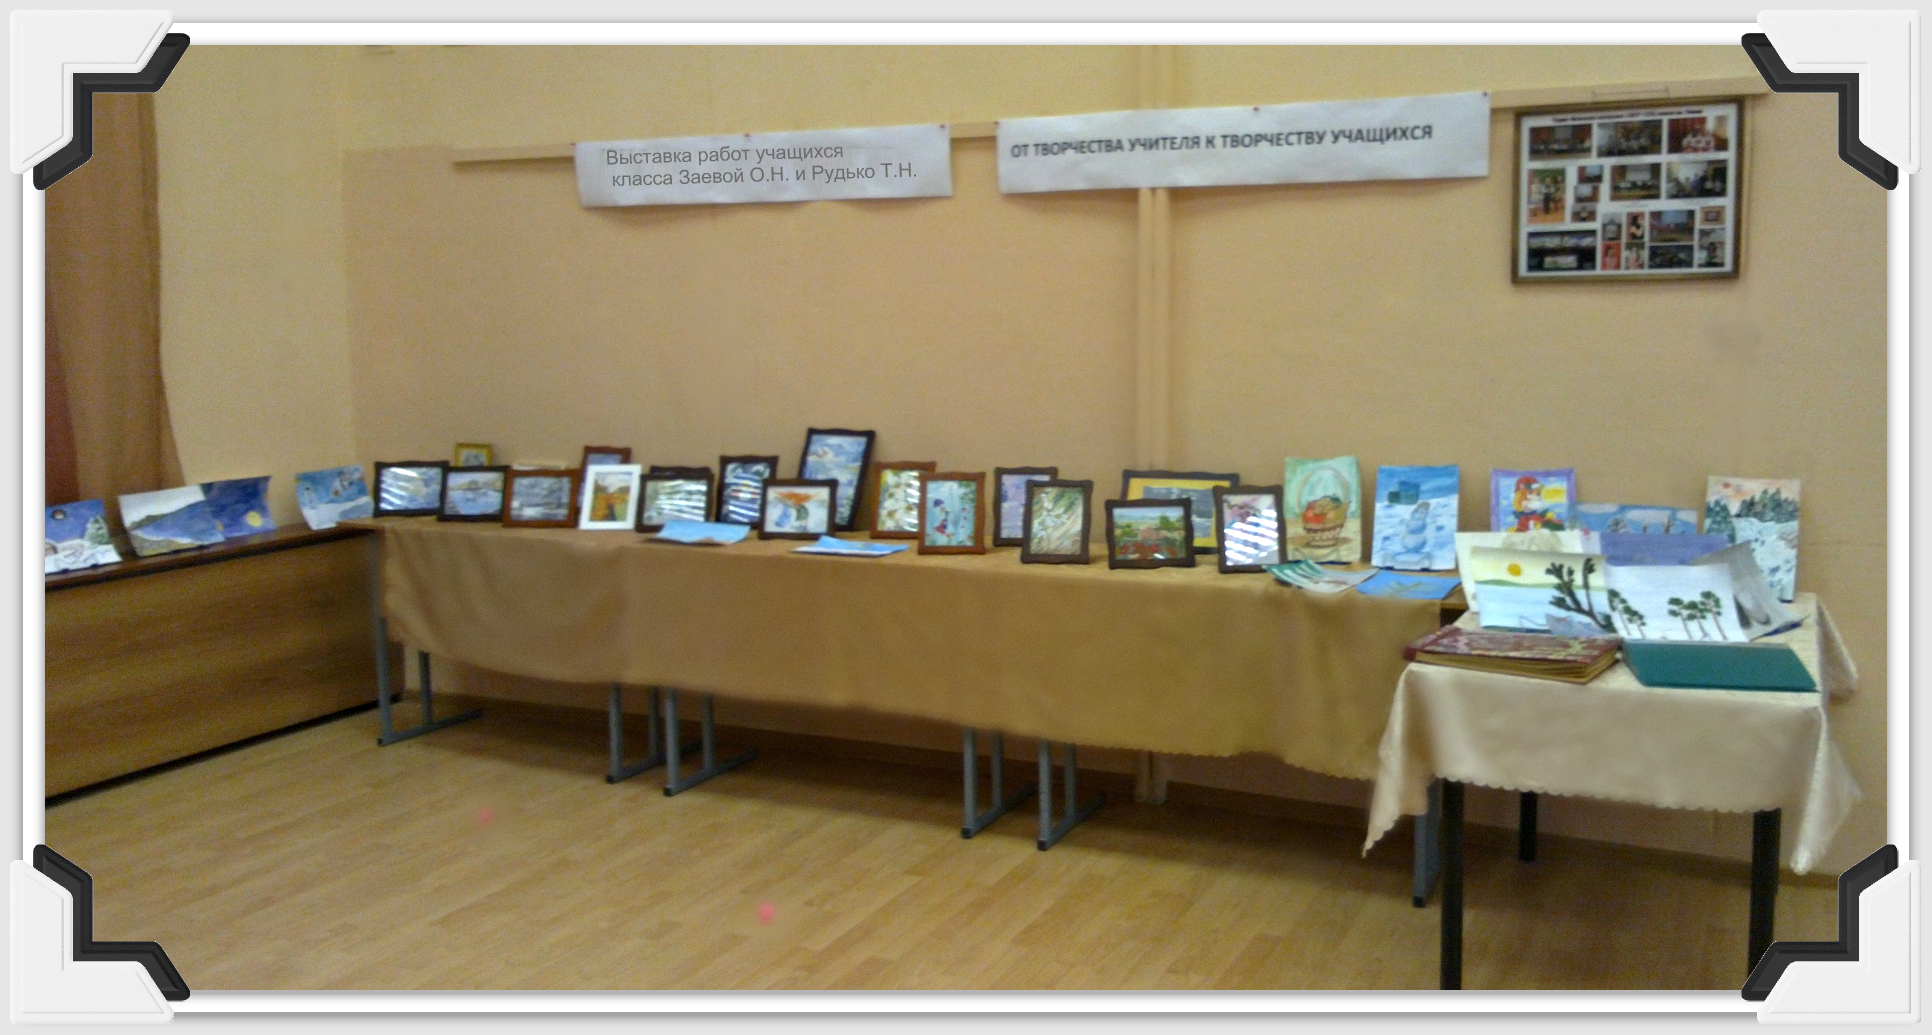 Выставка работ учащ-ся, 2013-2014г